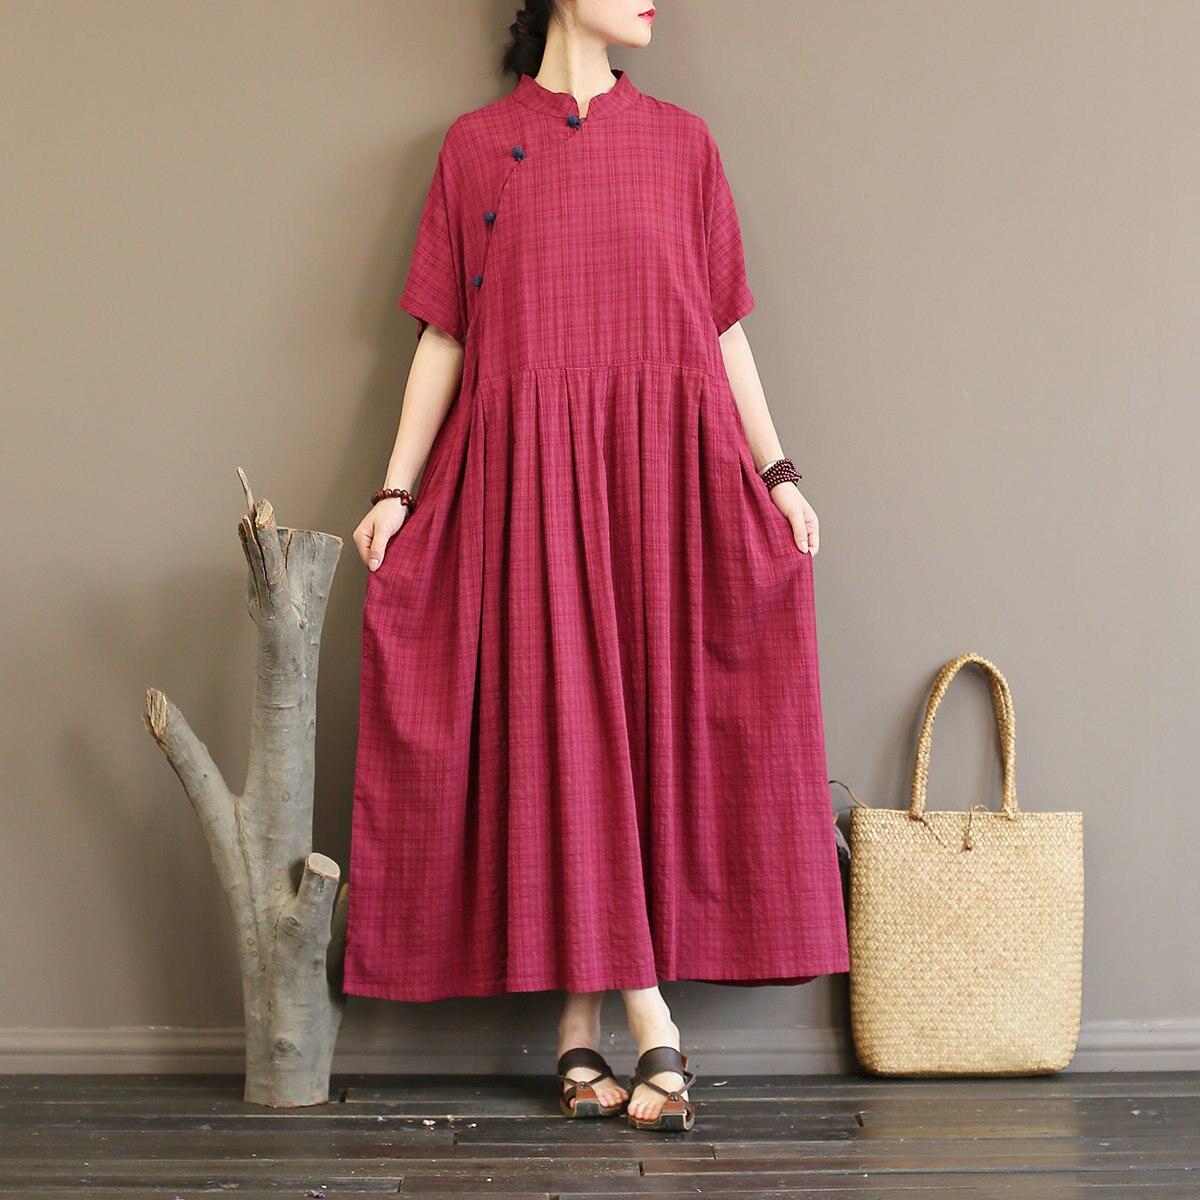 Women National Vintage Style Long Dresses Stand Collar Plate Buckle Summer High Waist Half Sleeve Loose Dresses